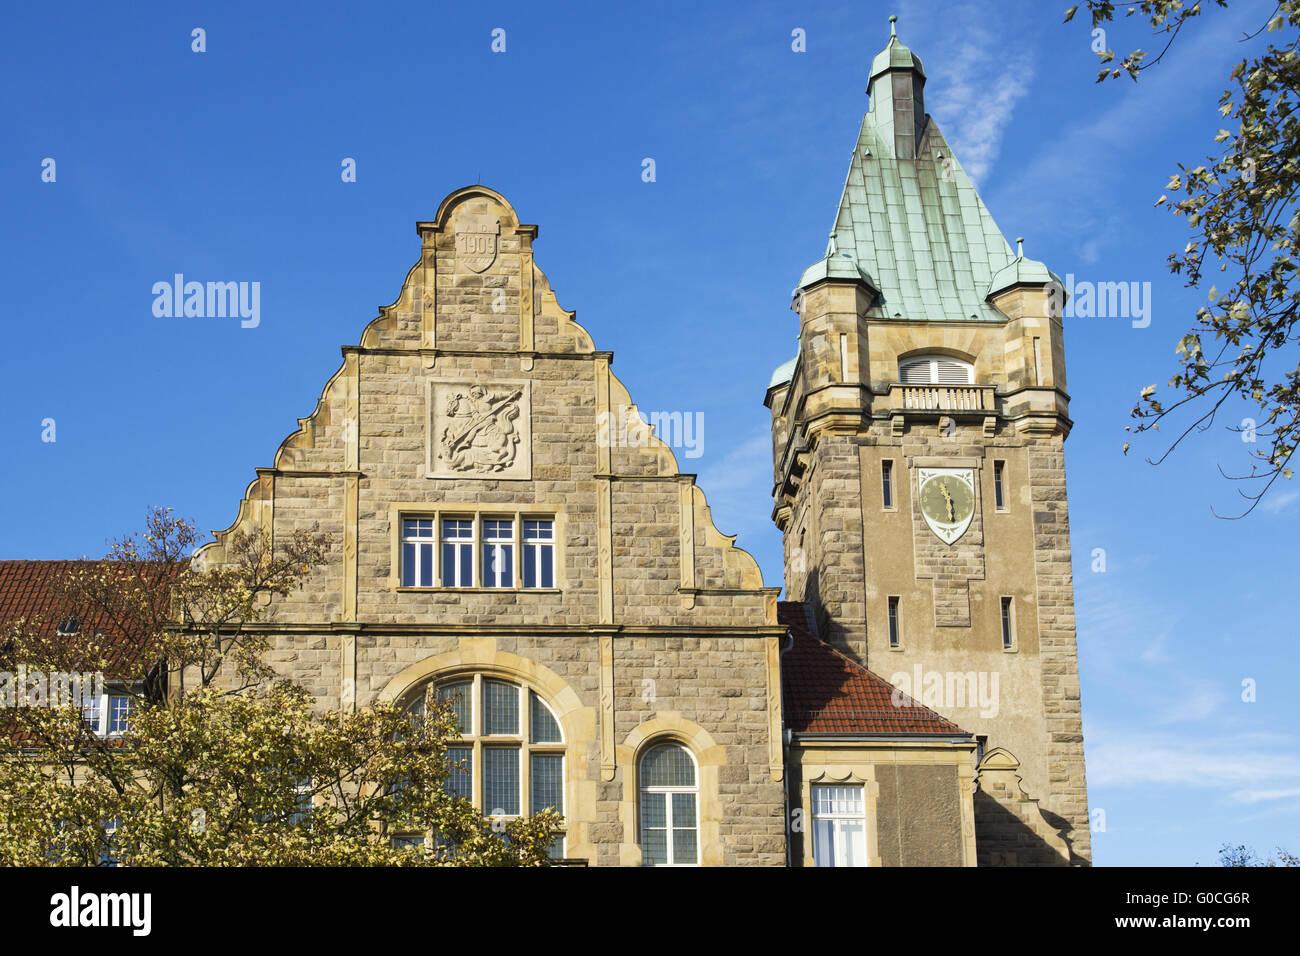 Town hall of Hattingen, Germany - Stock Image